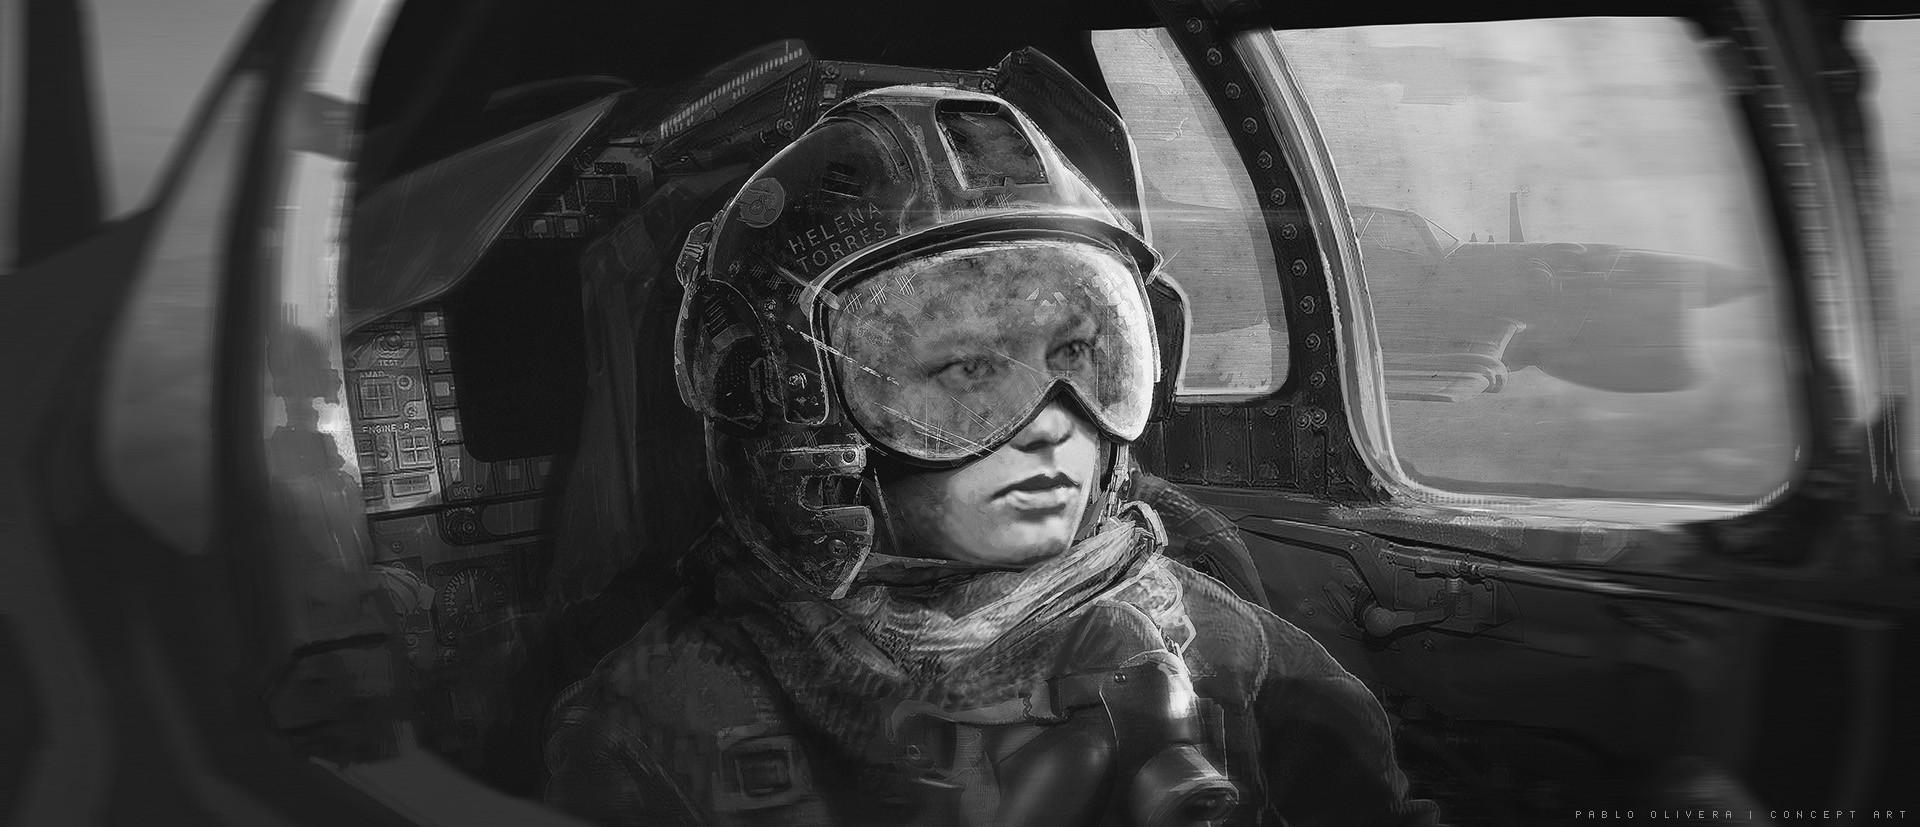 Pablo olivera helena pilot airplane concept art 05